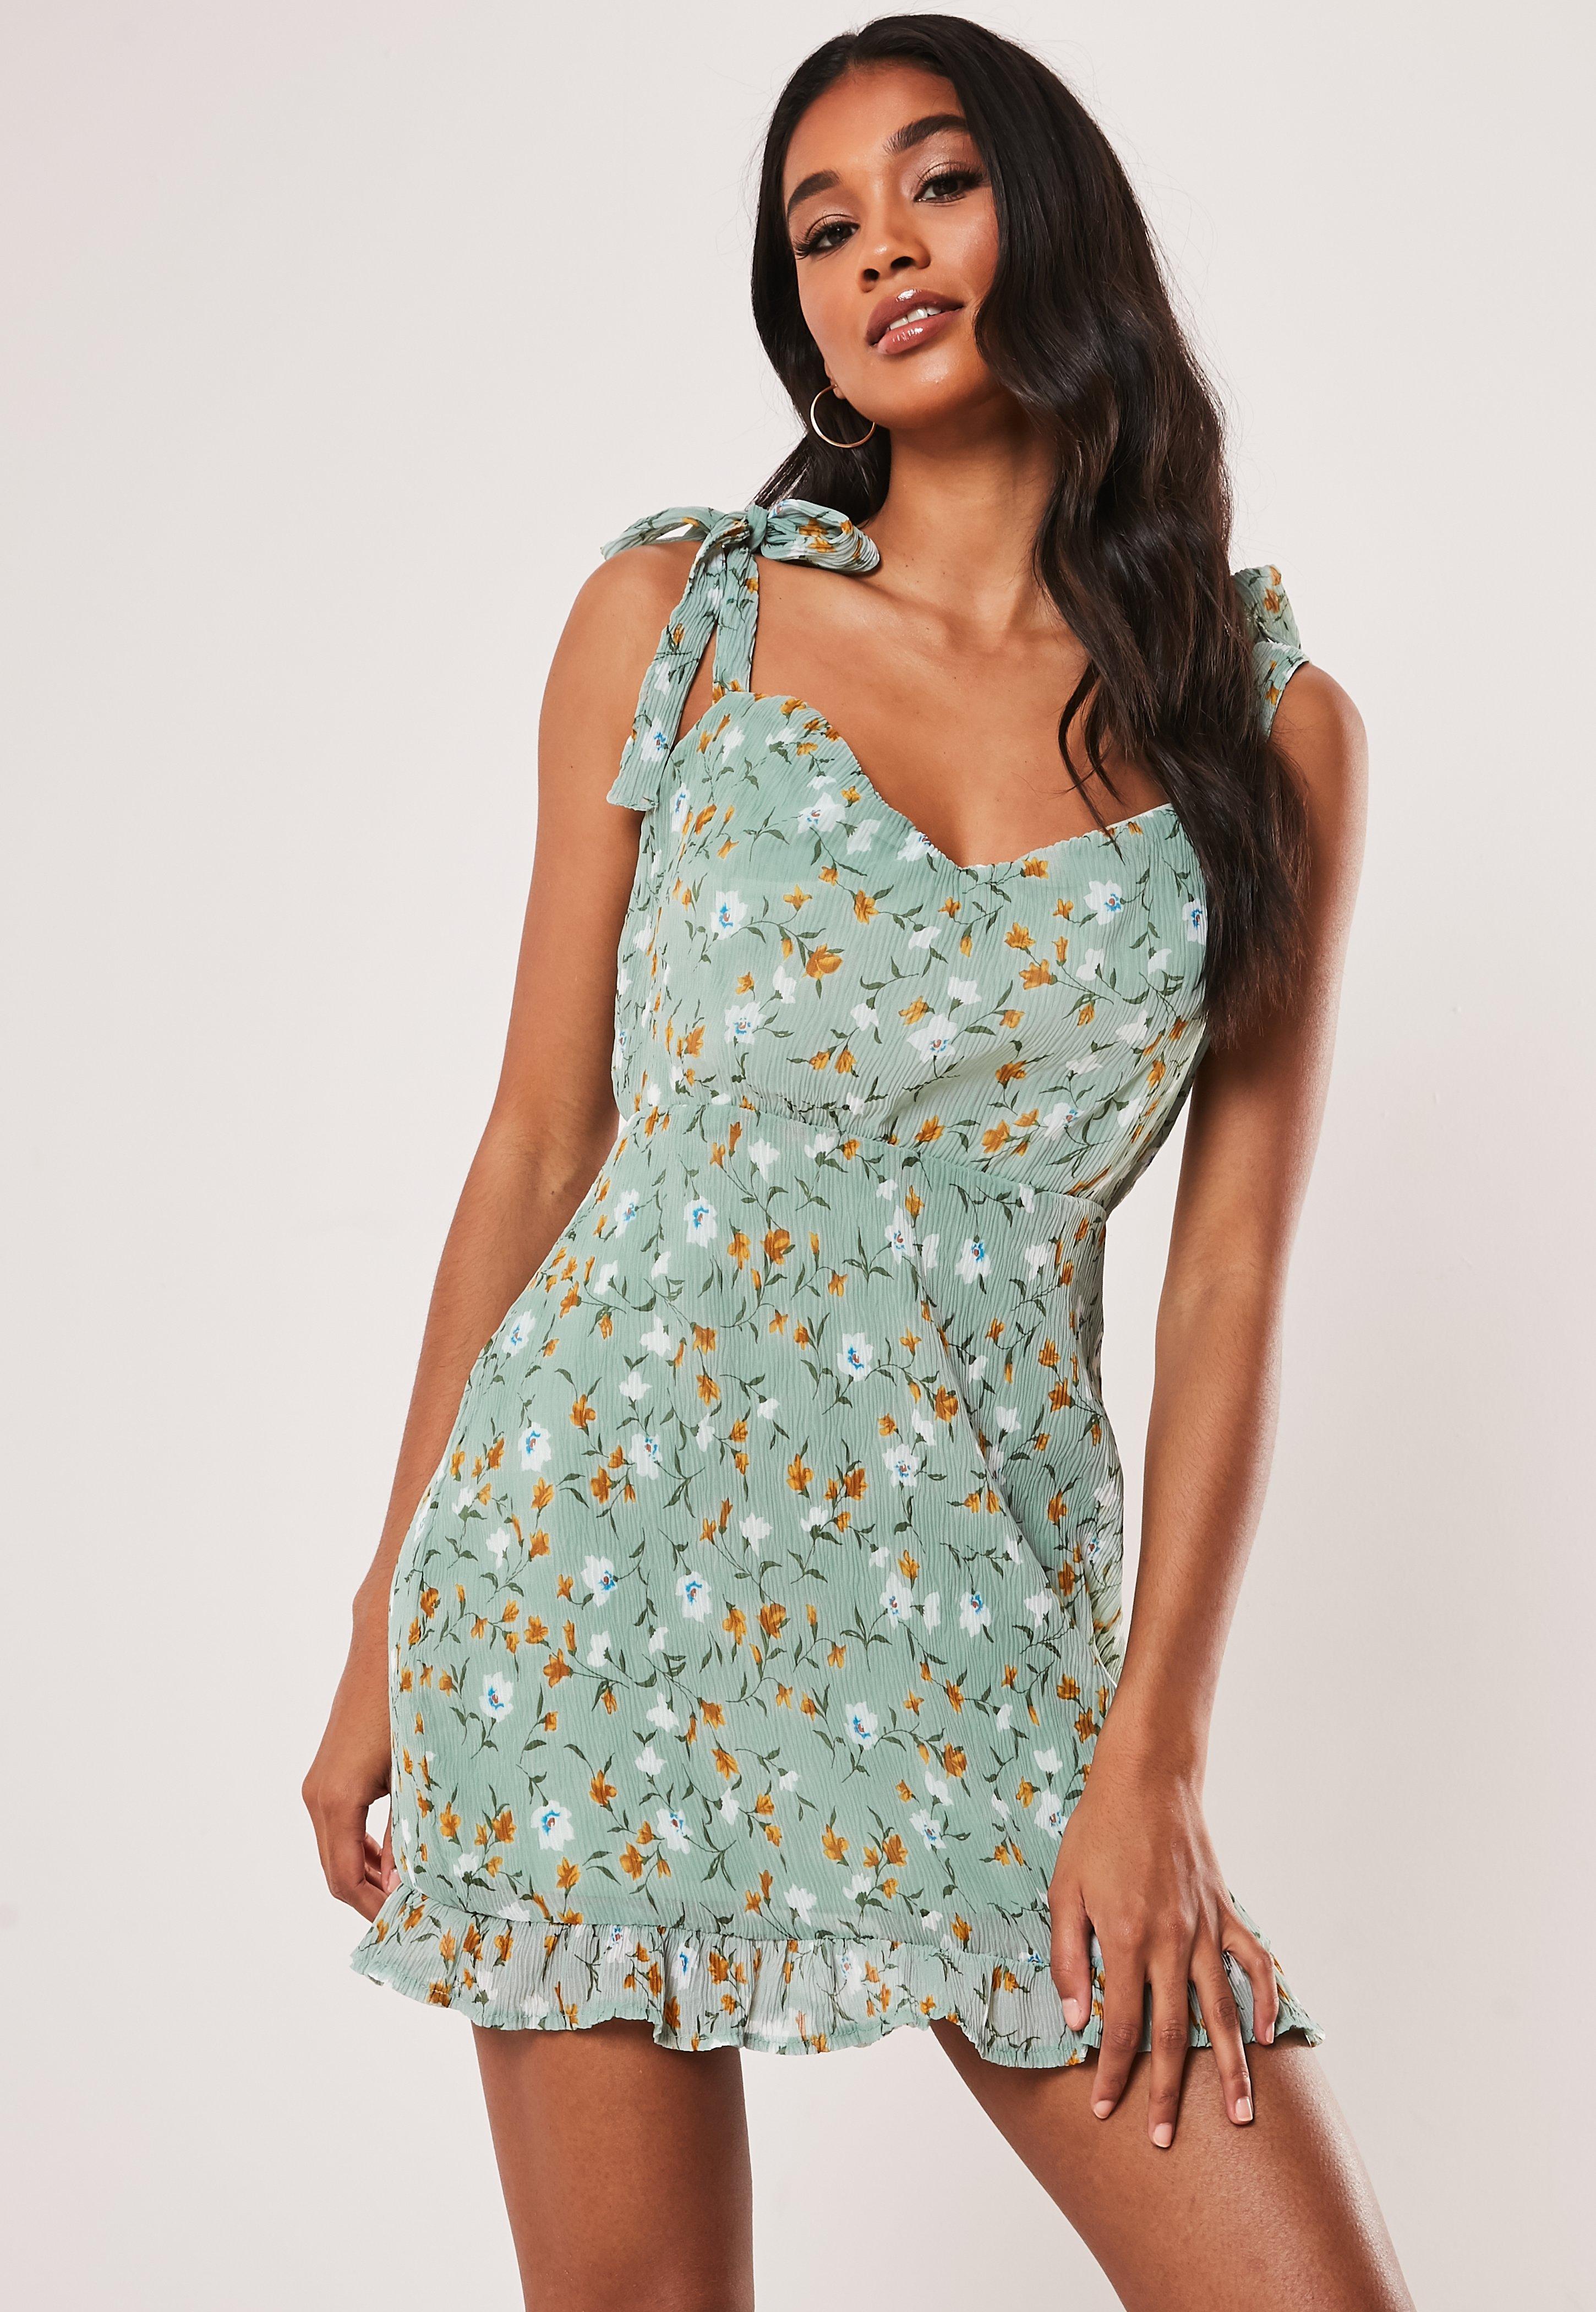 56467bd075e95 Floral Dresses | Flower Print Dresses - Missguided